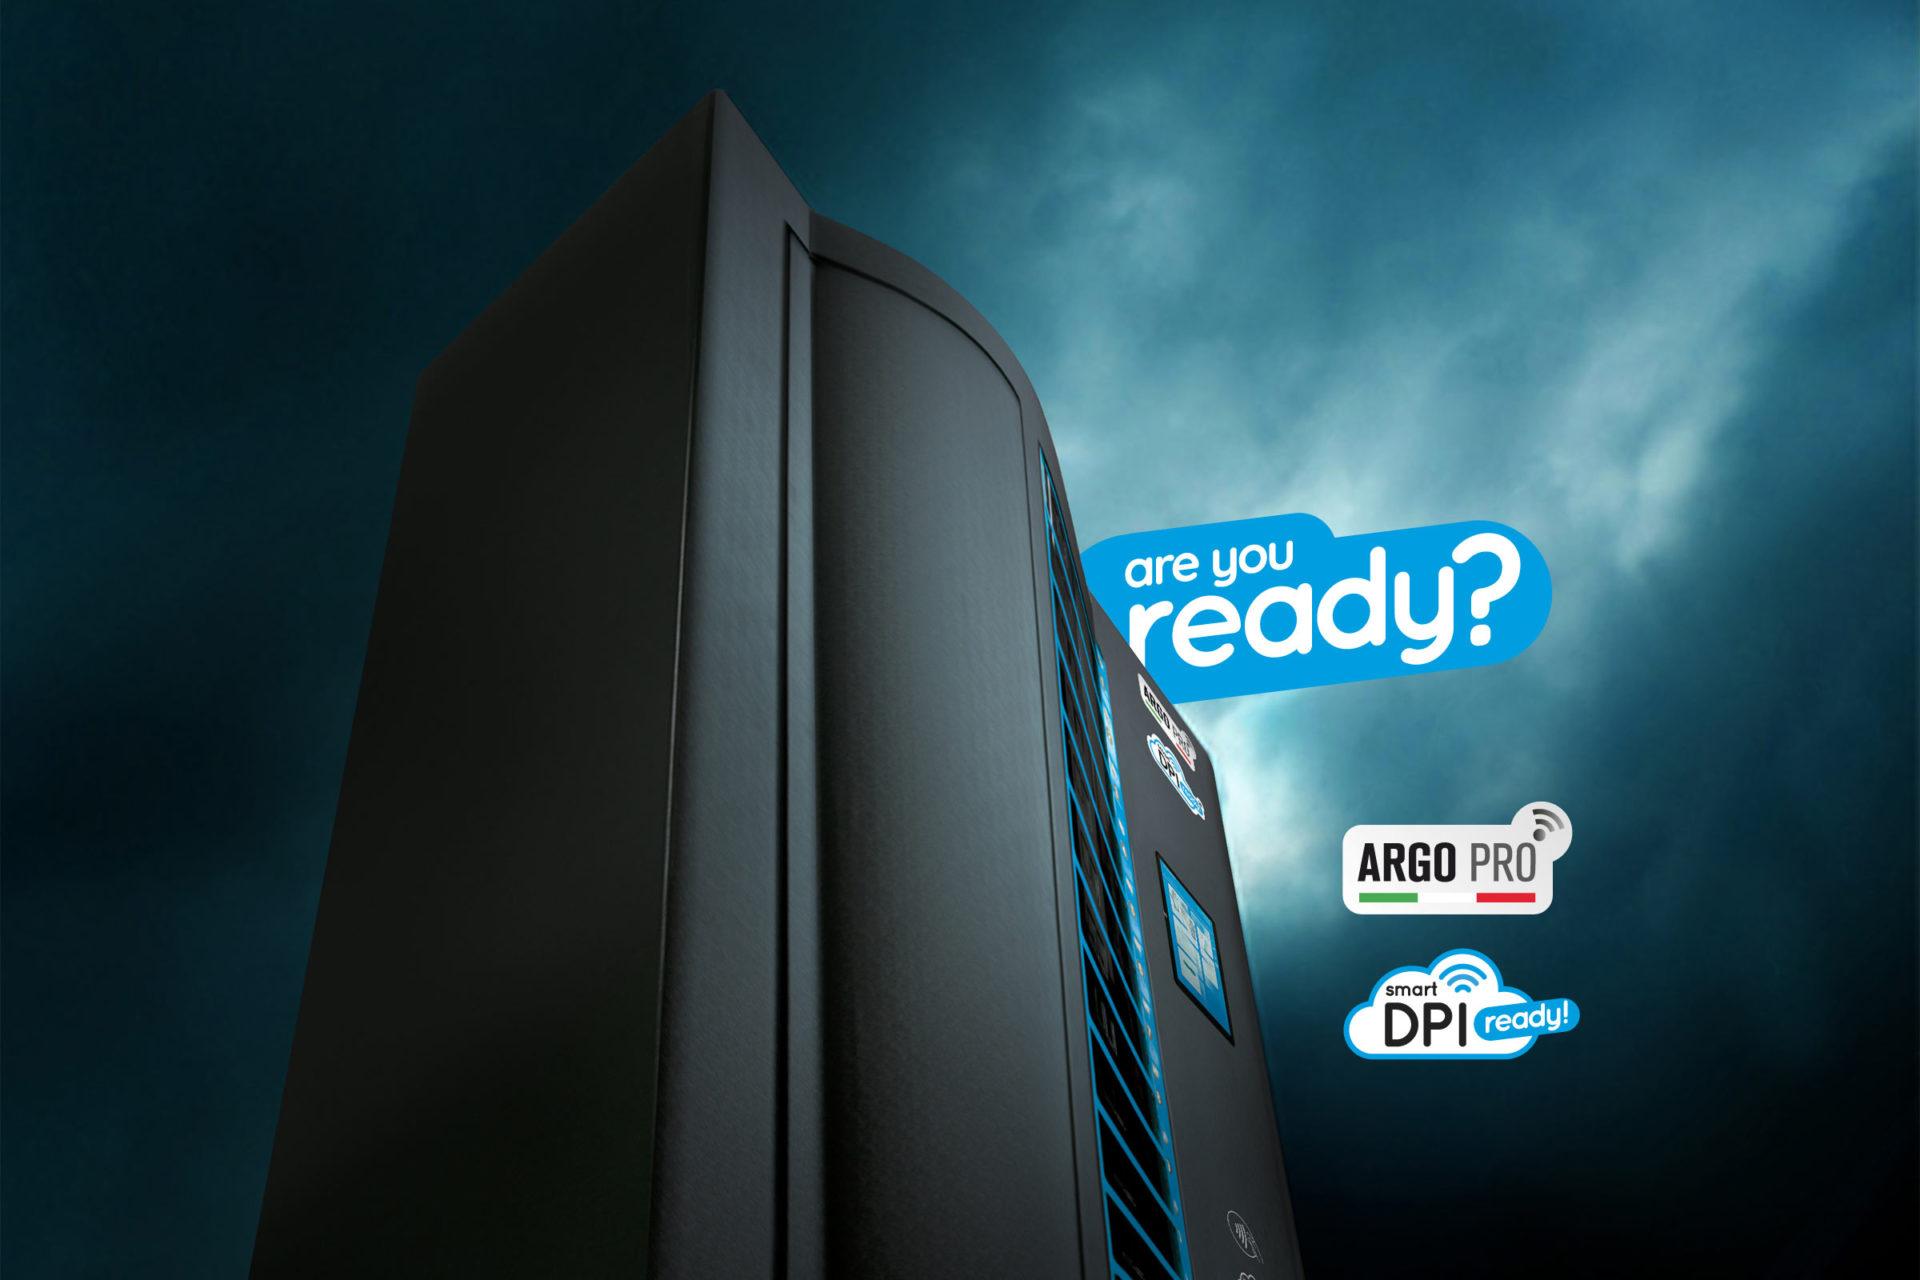 smart-dpi-ready